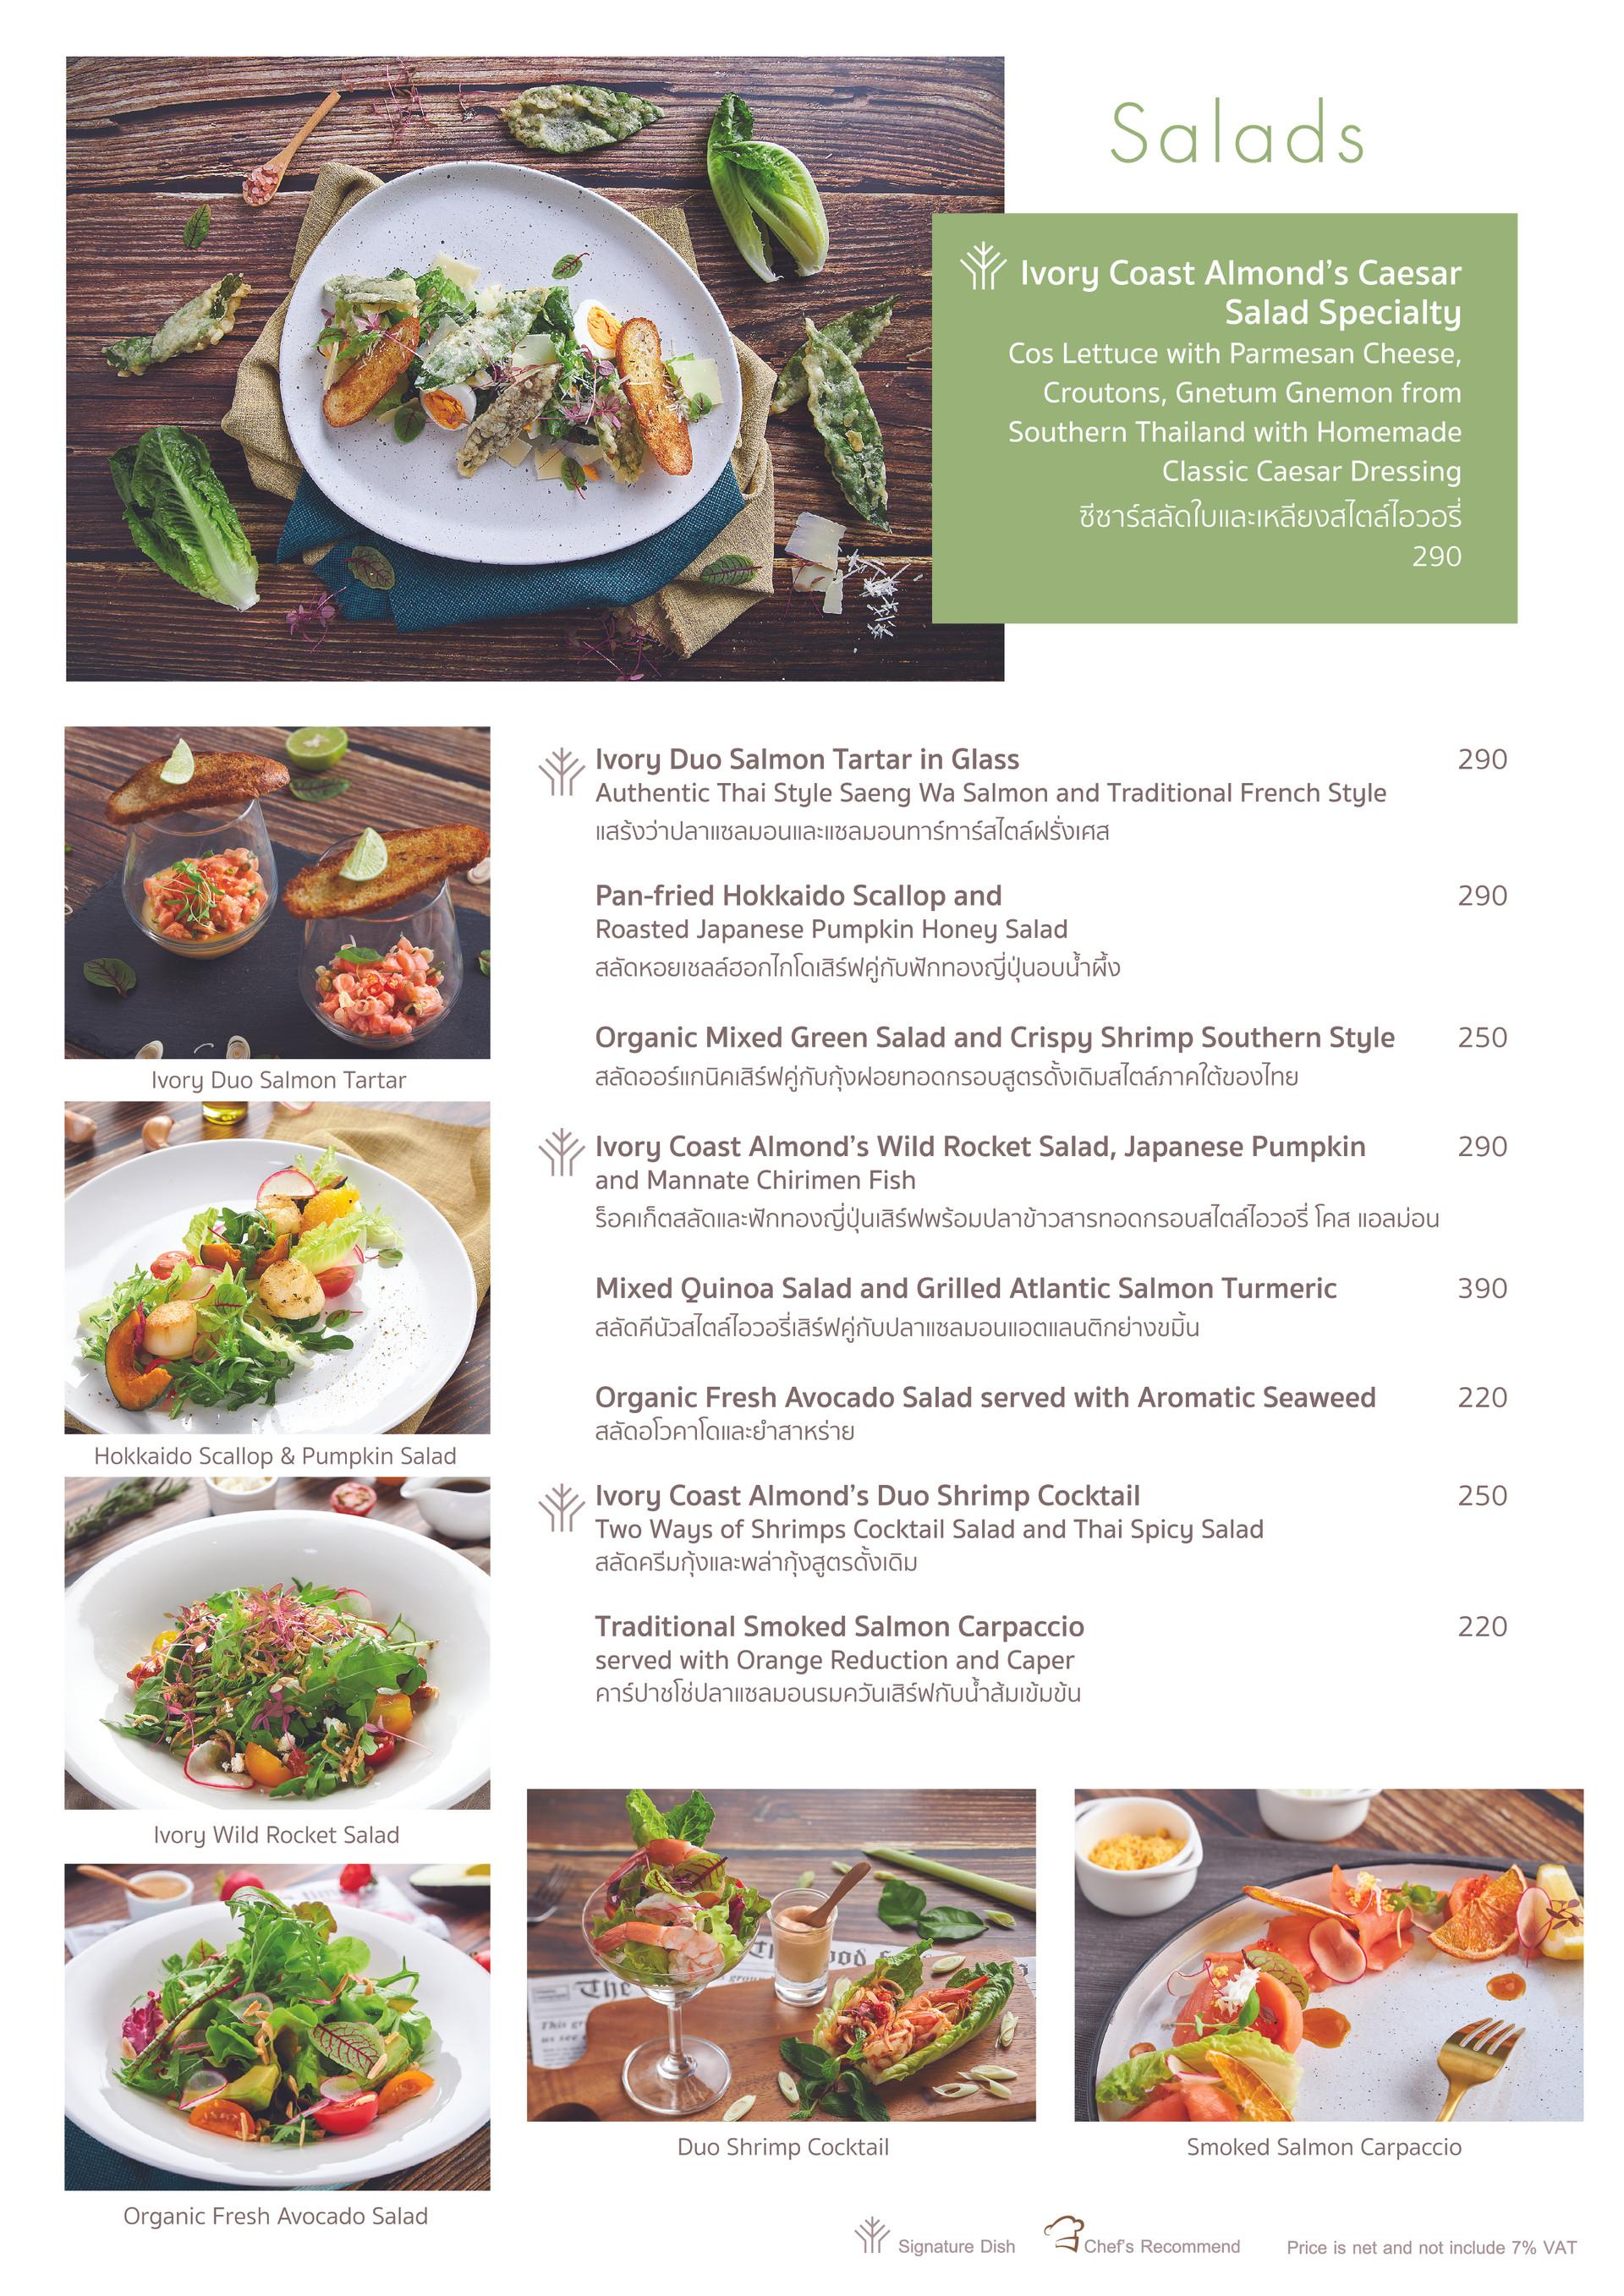 ivc new menu_04.jpg